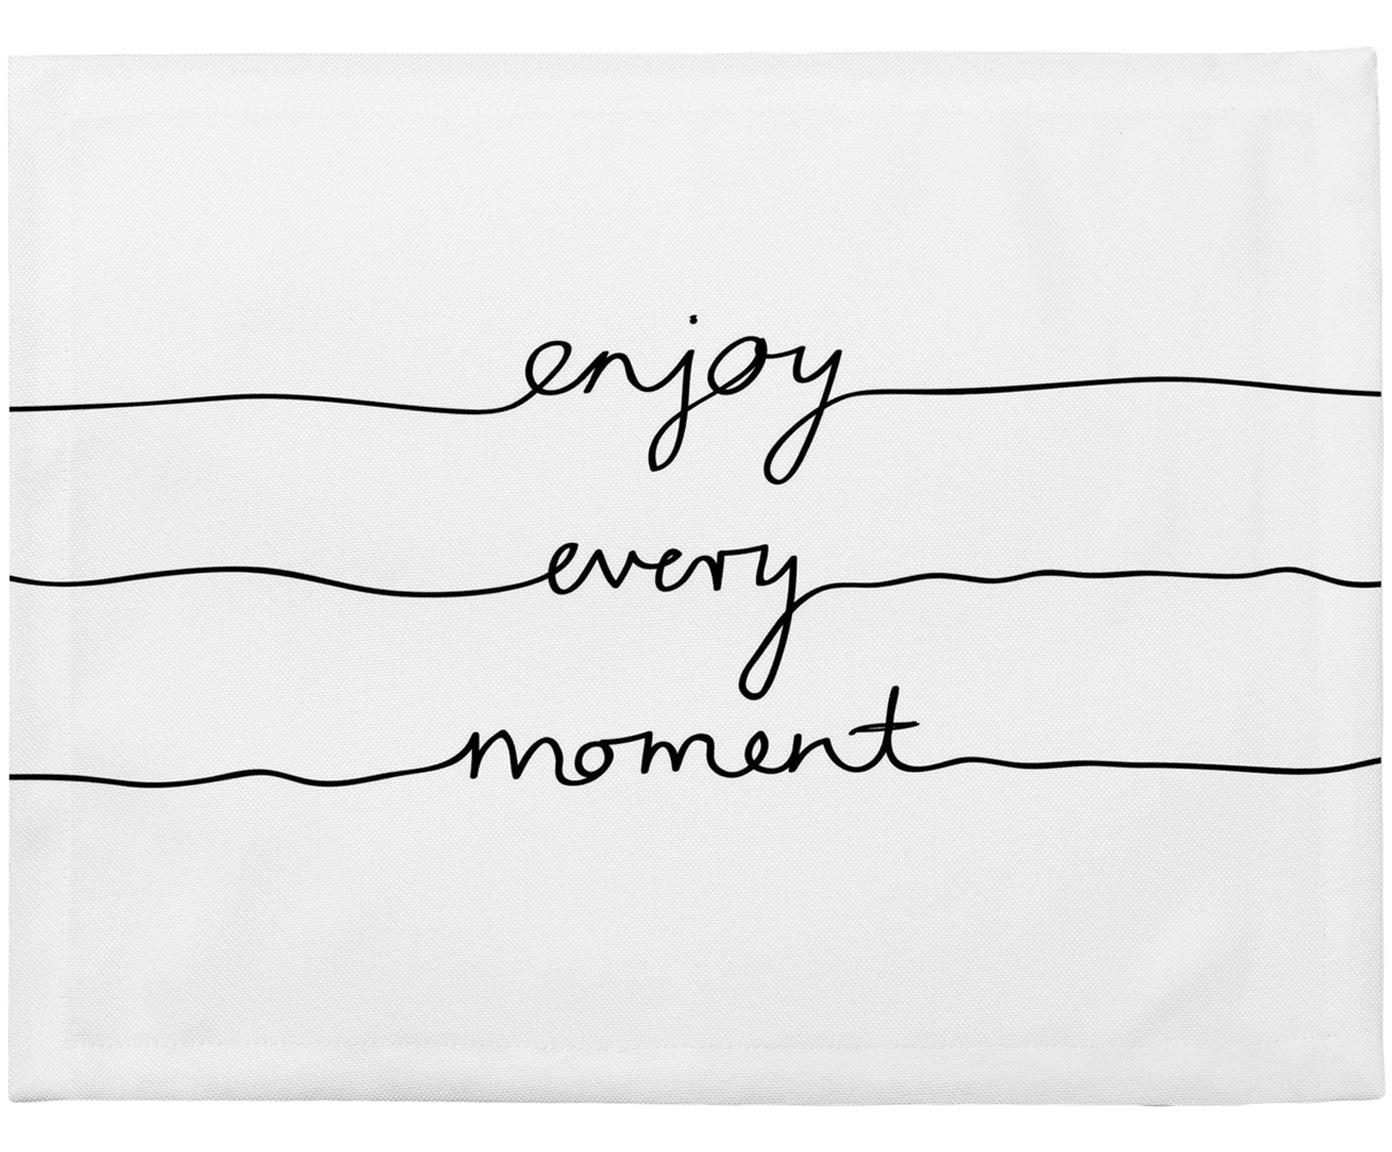 Tischsets Enjoy every Moment, 4 Stück, Polyester, Schwarz, Weiss, 35 x 45 cm